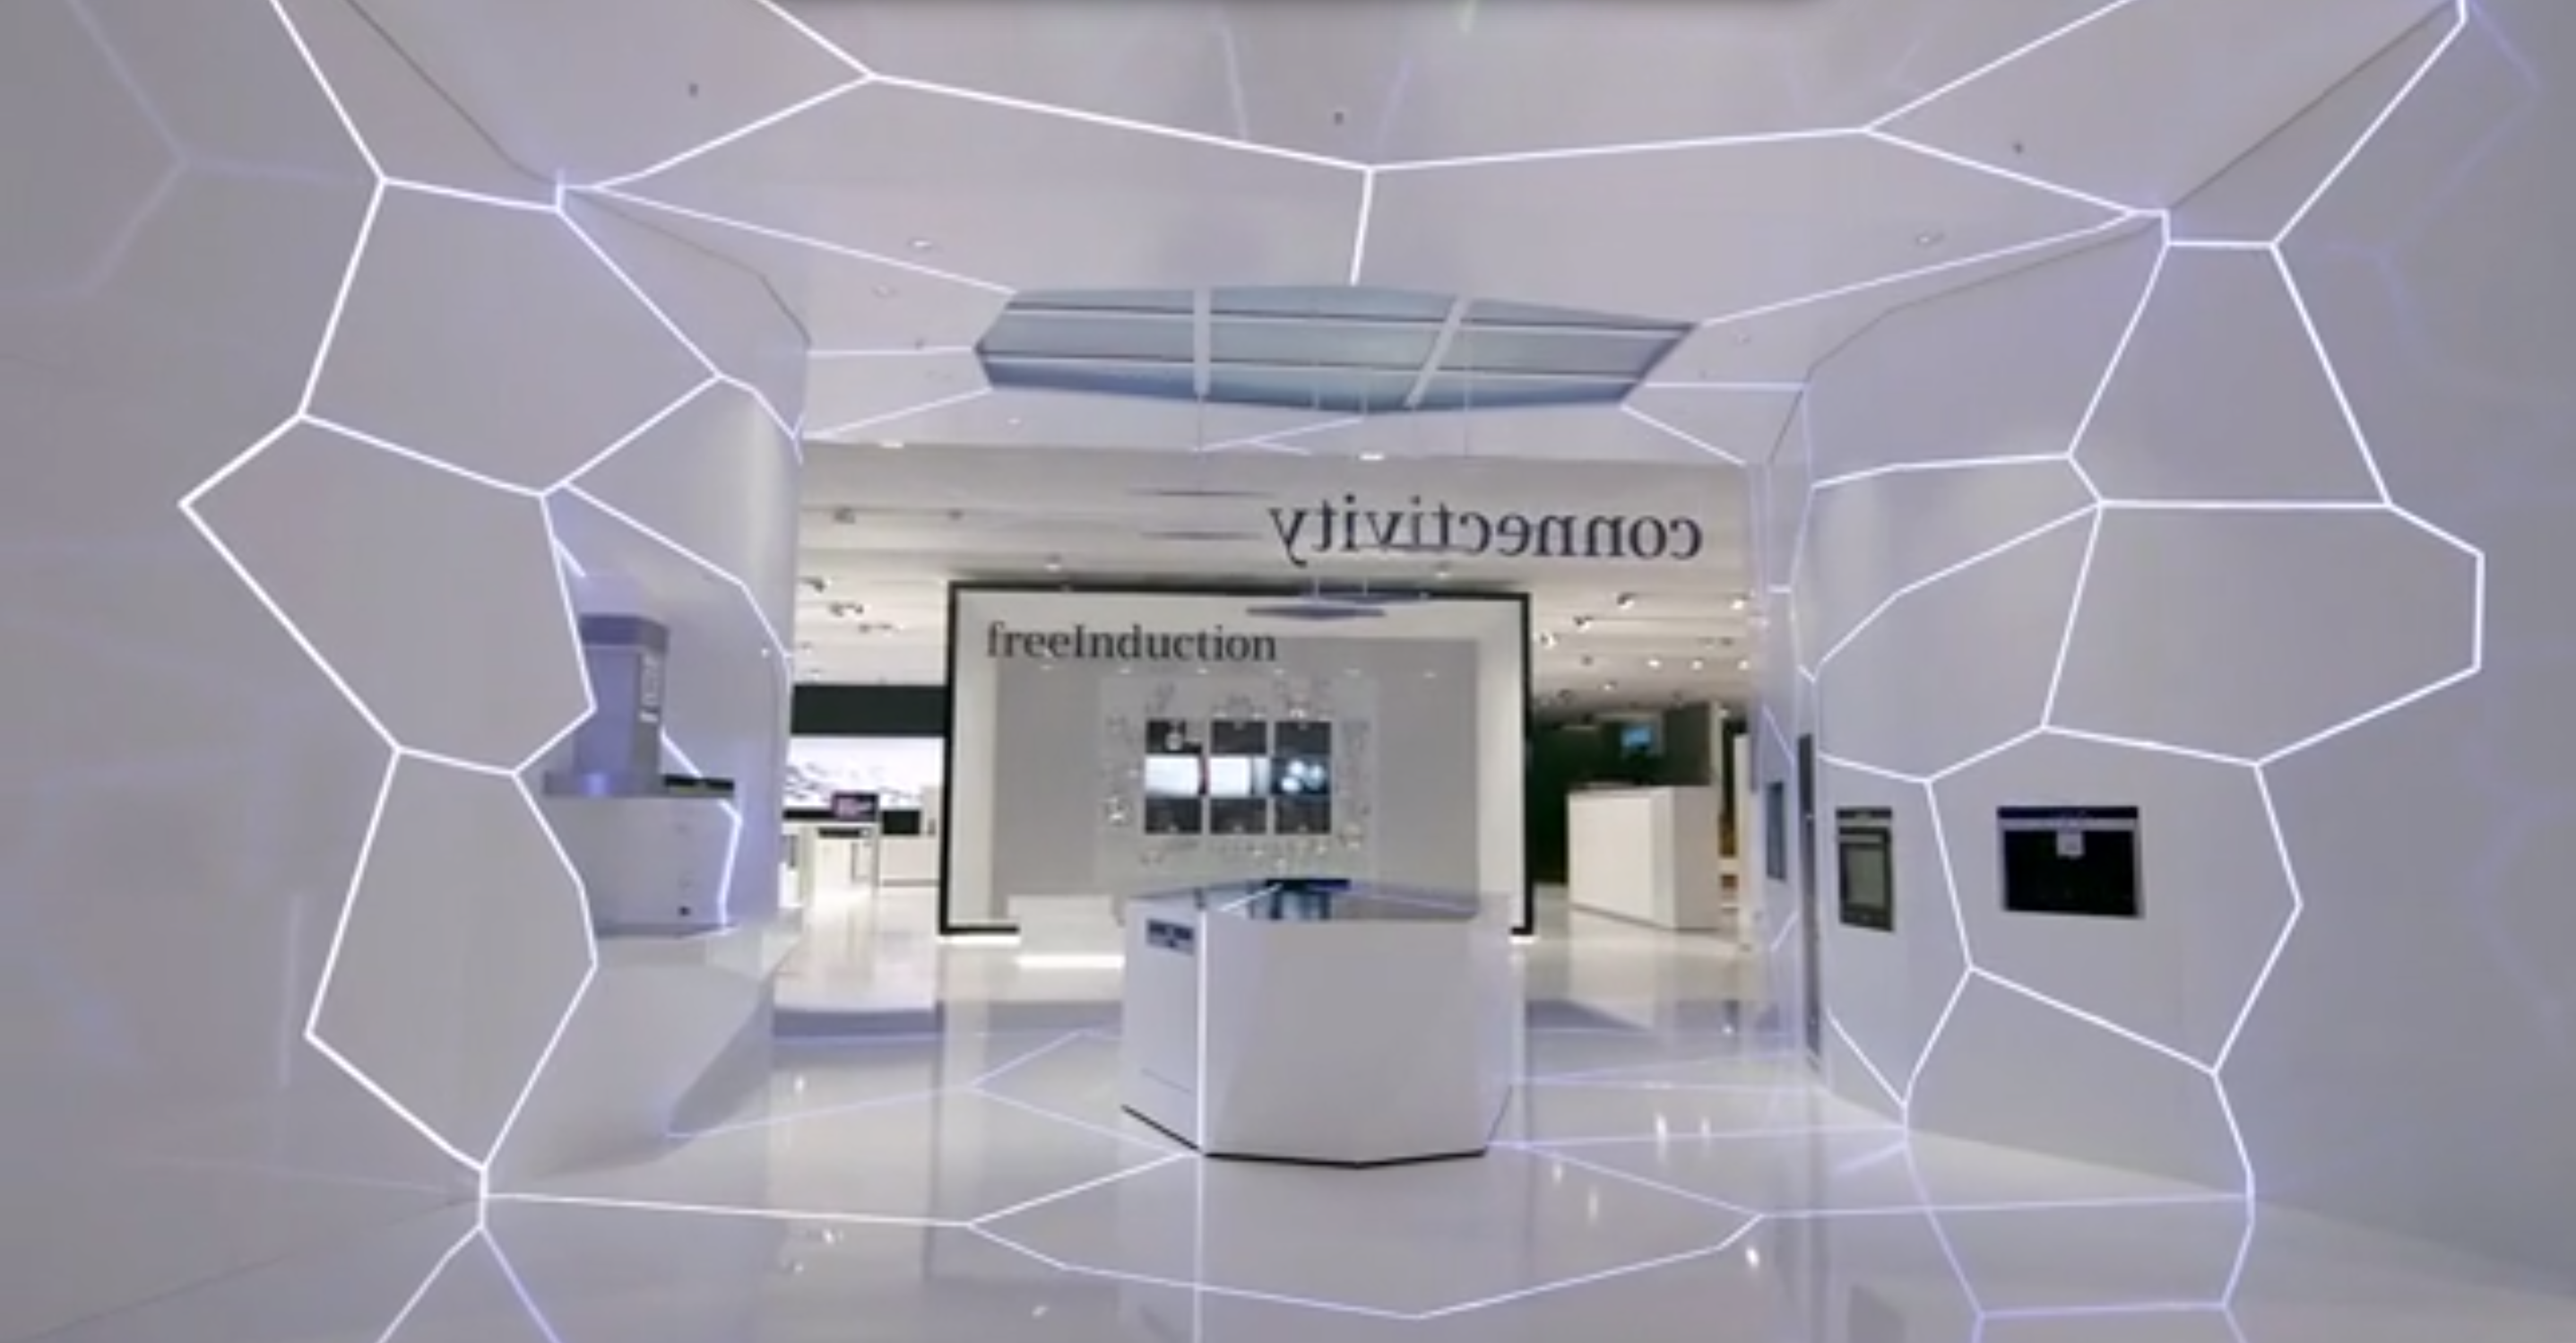 Exhibition Stand Design Leicester : Futuristic exhibition stand exhibition is t me innovation